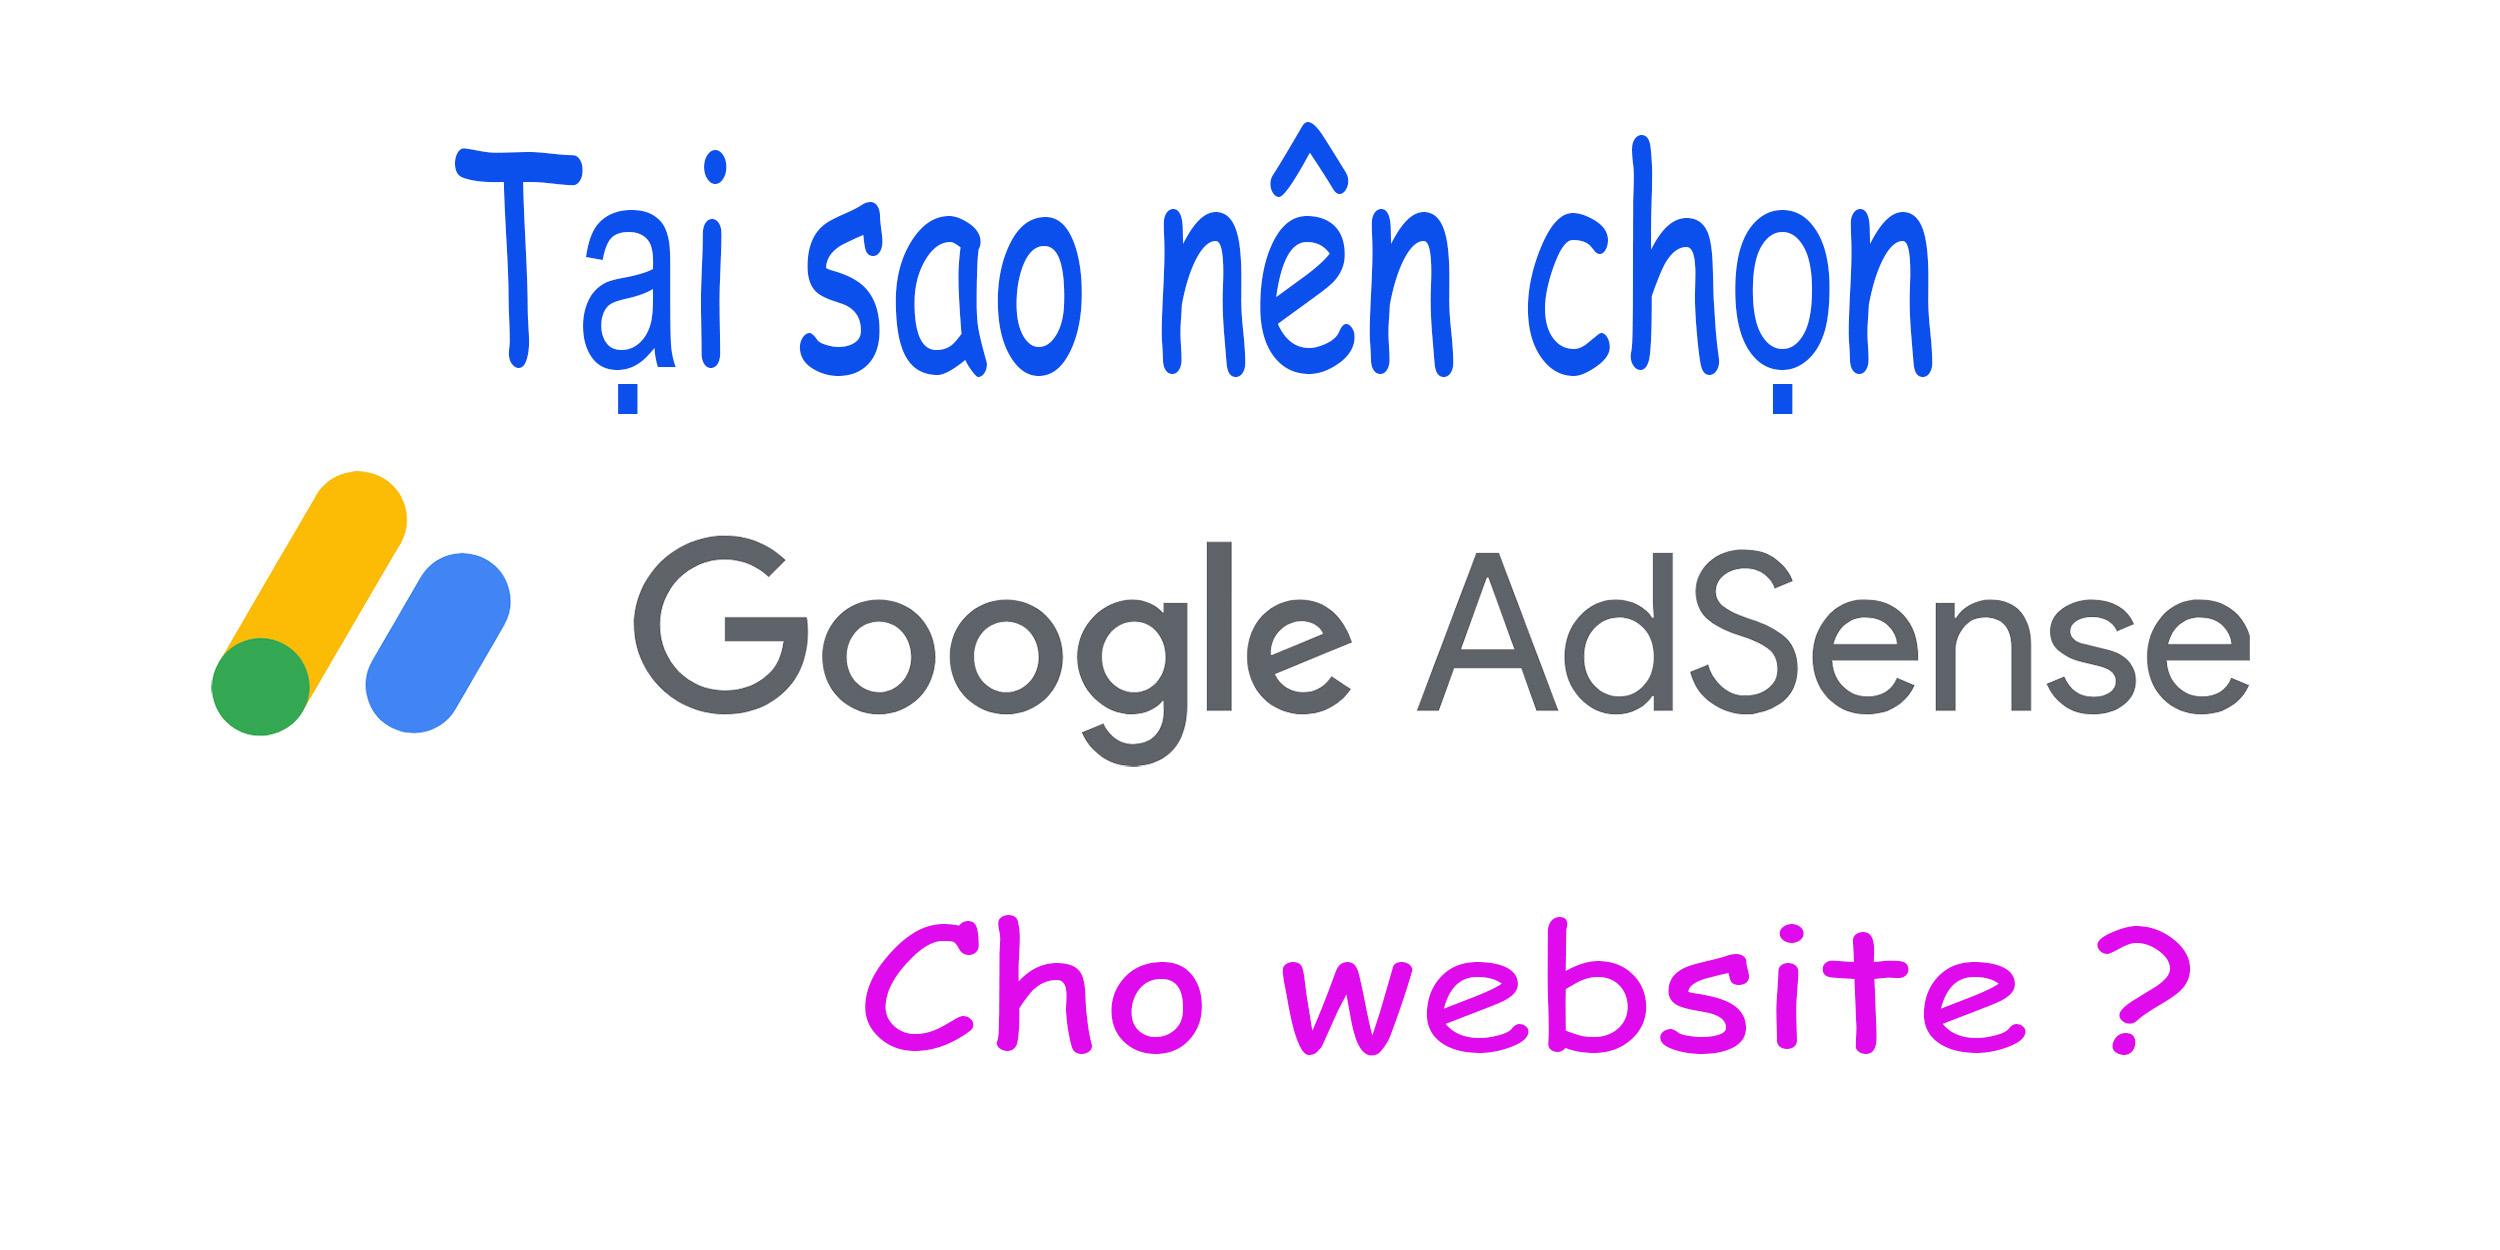 tai sao nen chon google adsene cho webstie